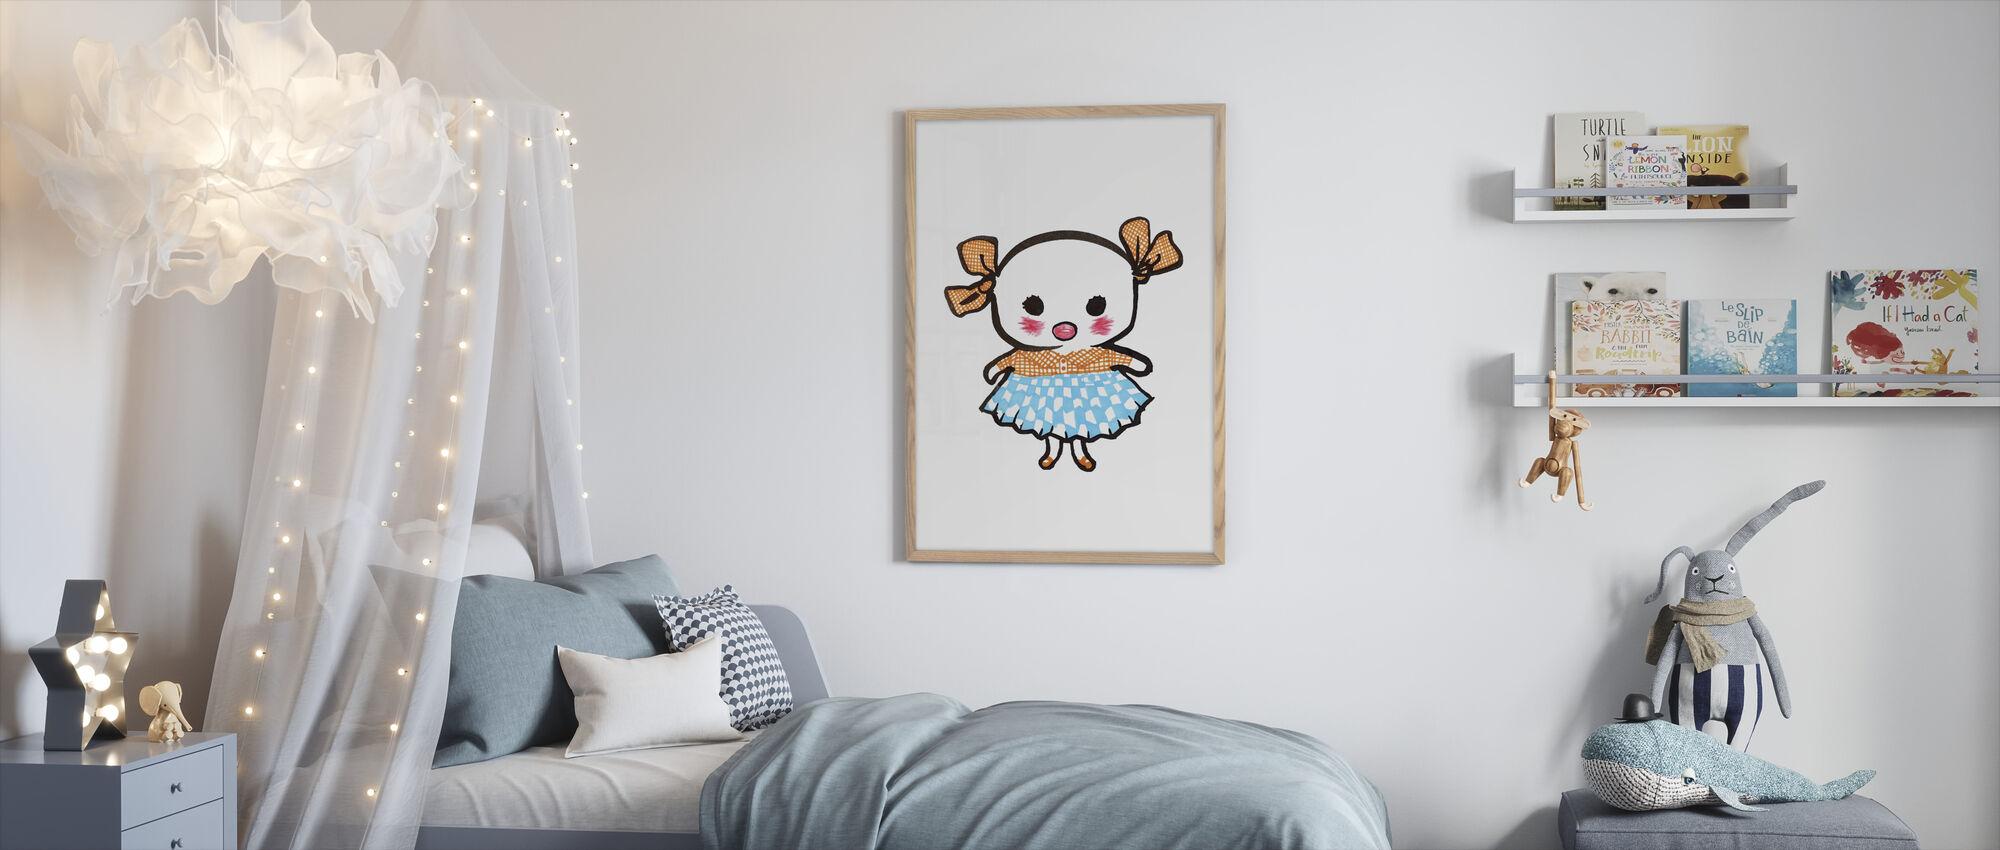 Lill-Stina - Framed print - Kids Room